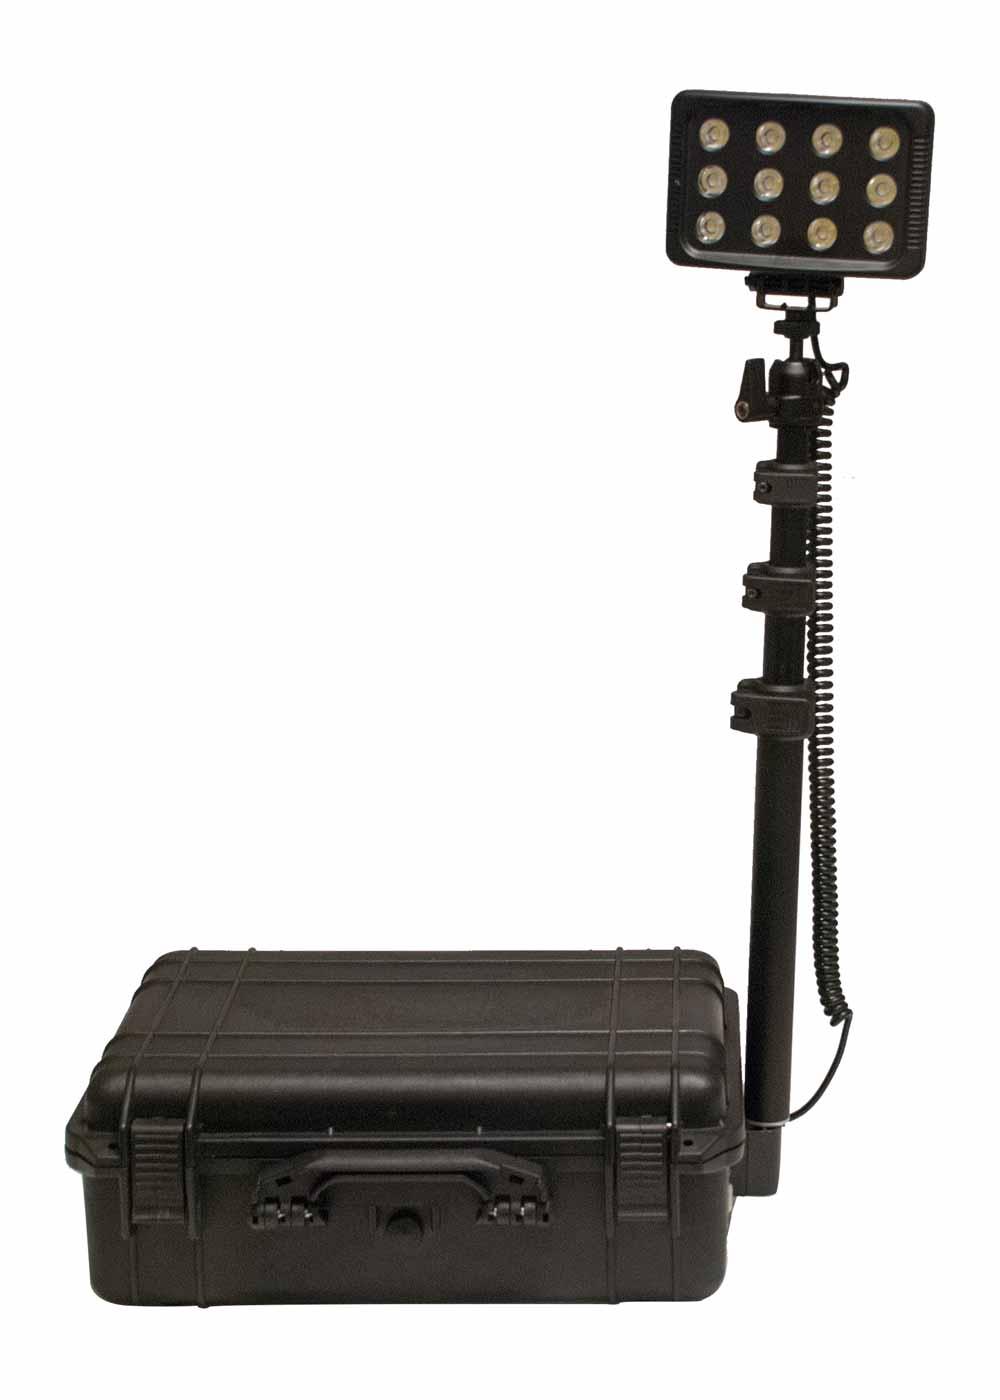 Xl200 Portable Remote Area Led Lighting System Tuff Led